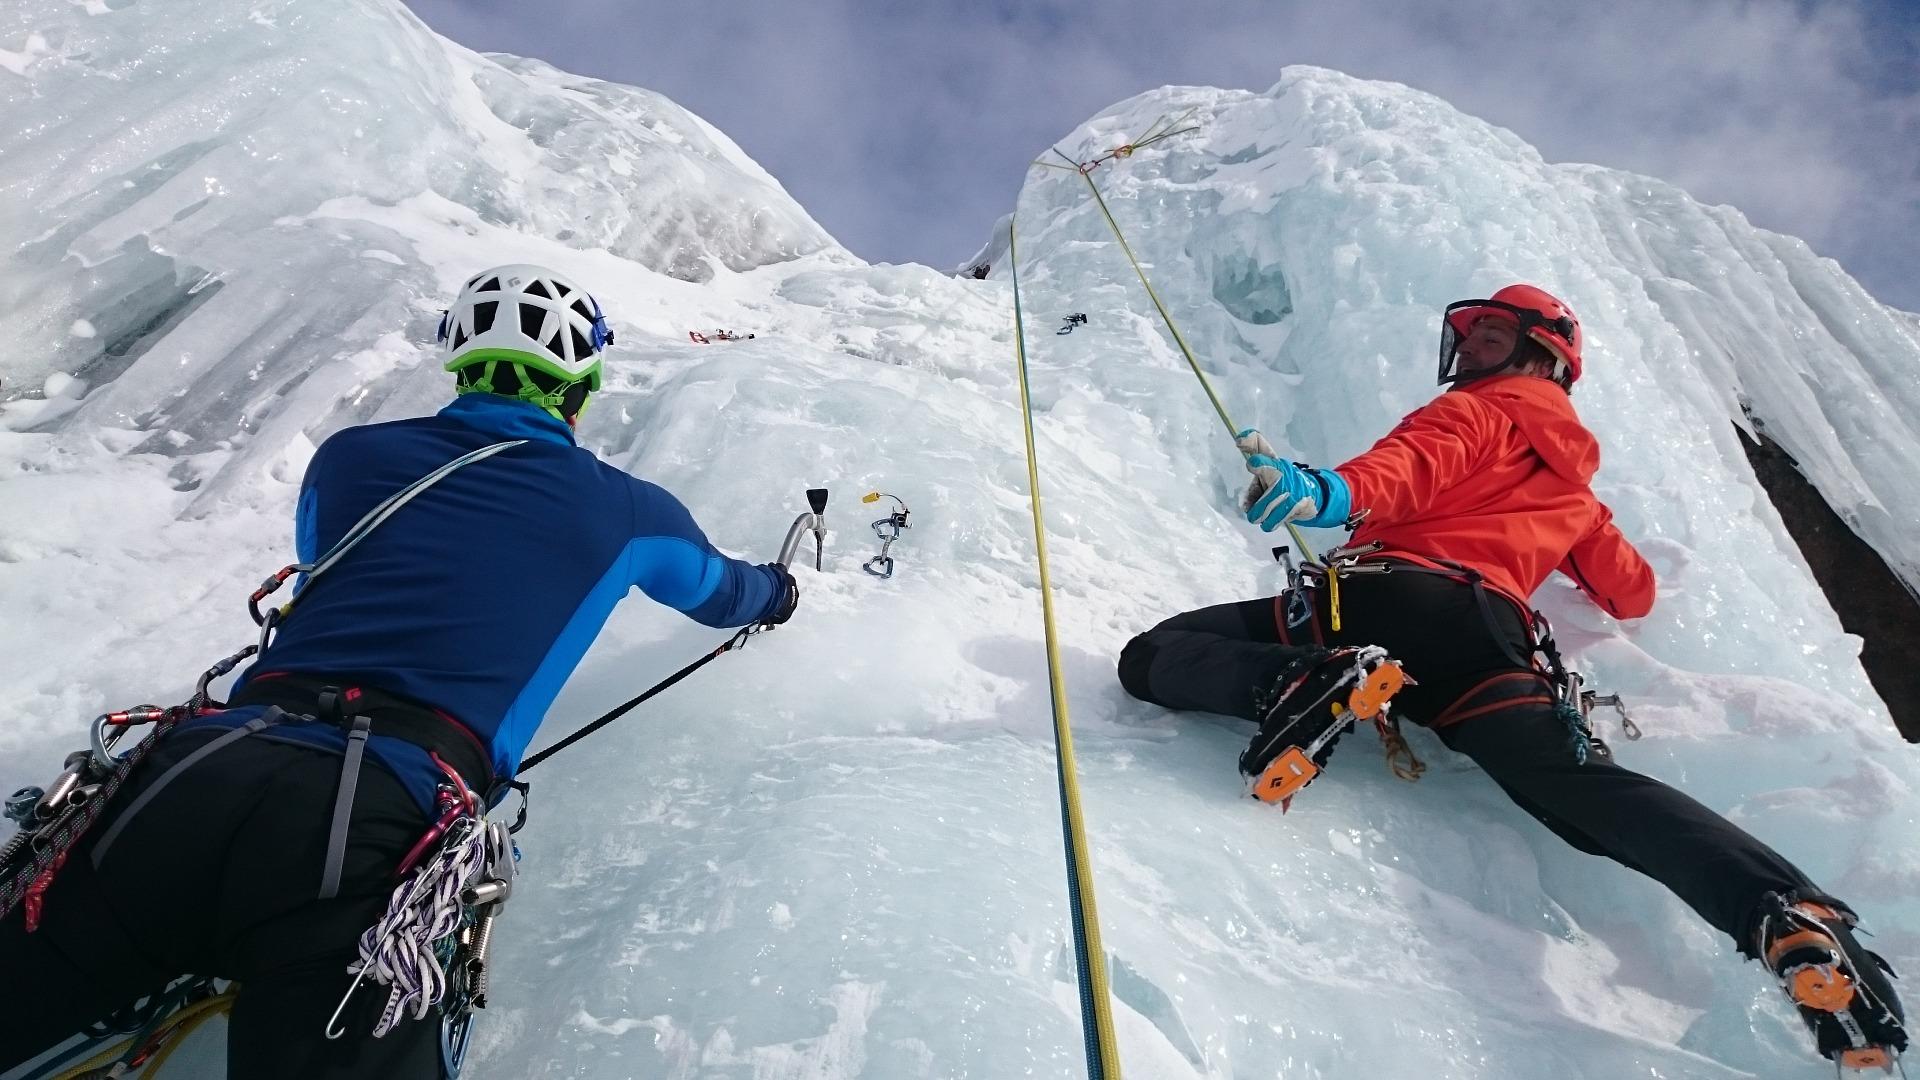 ice-climbing-1247606_1920 guide to chamonix